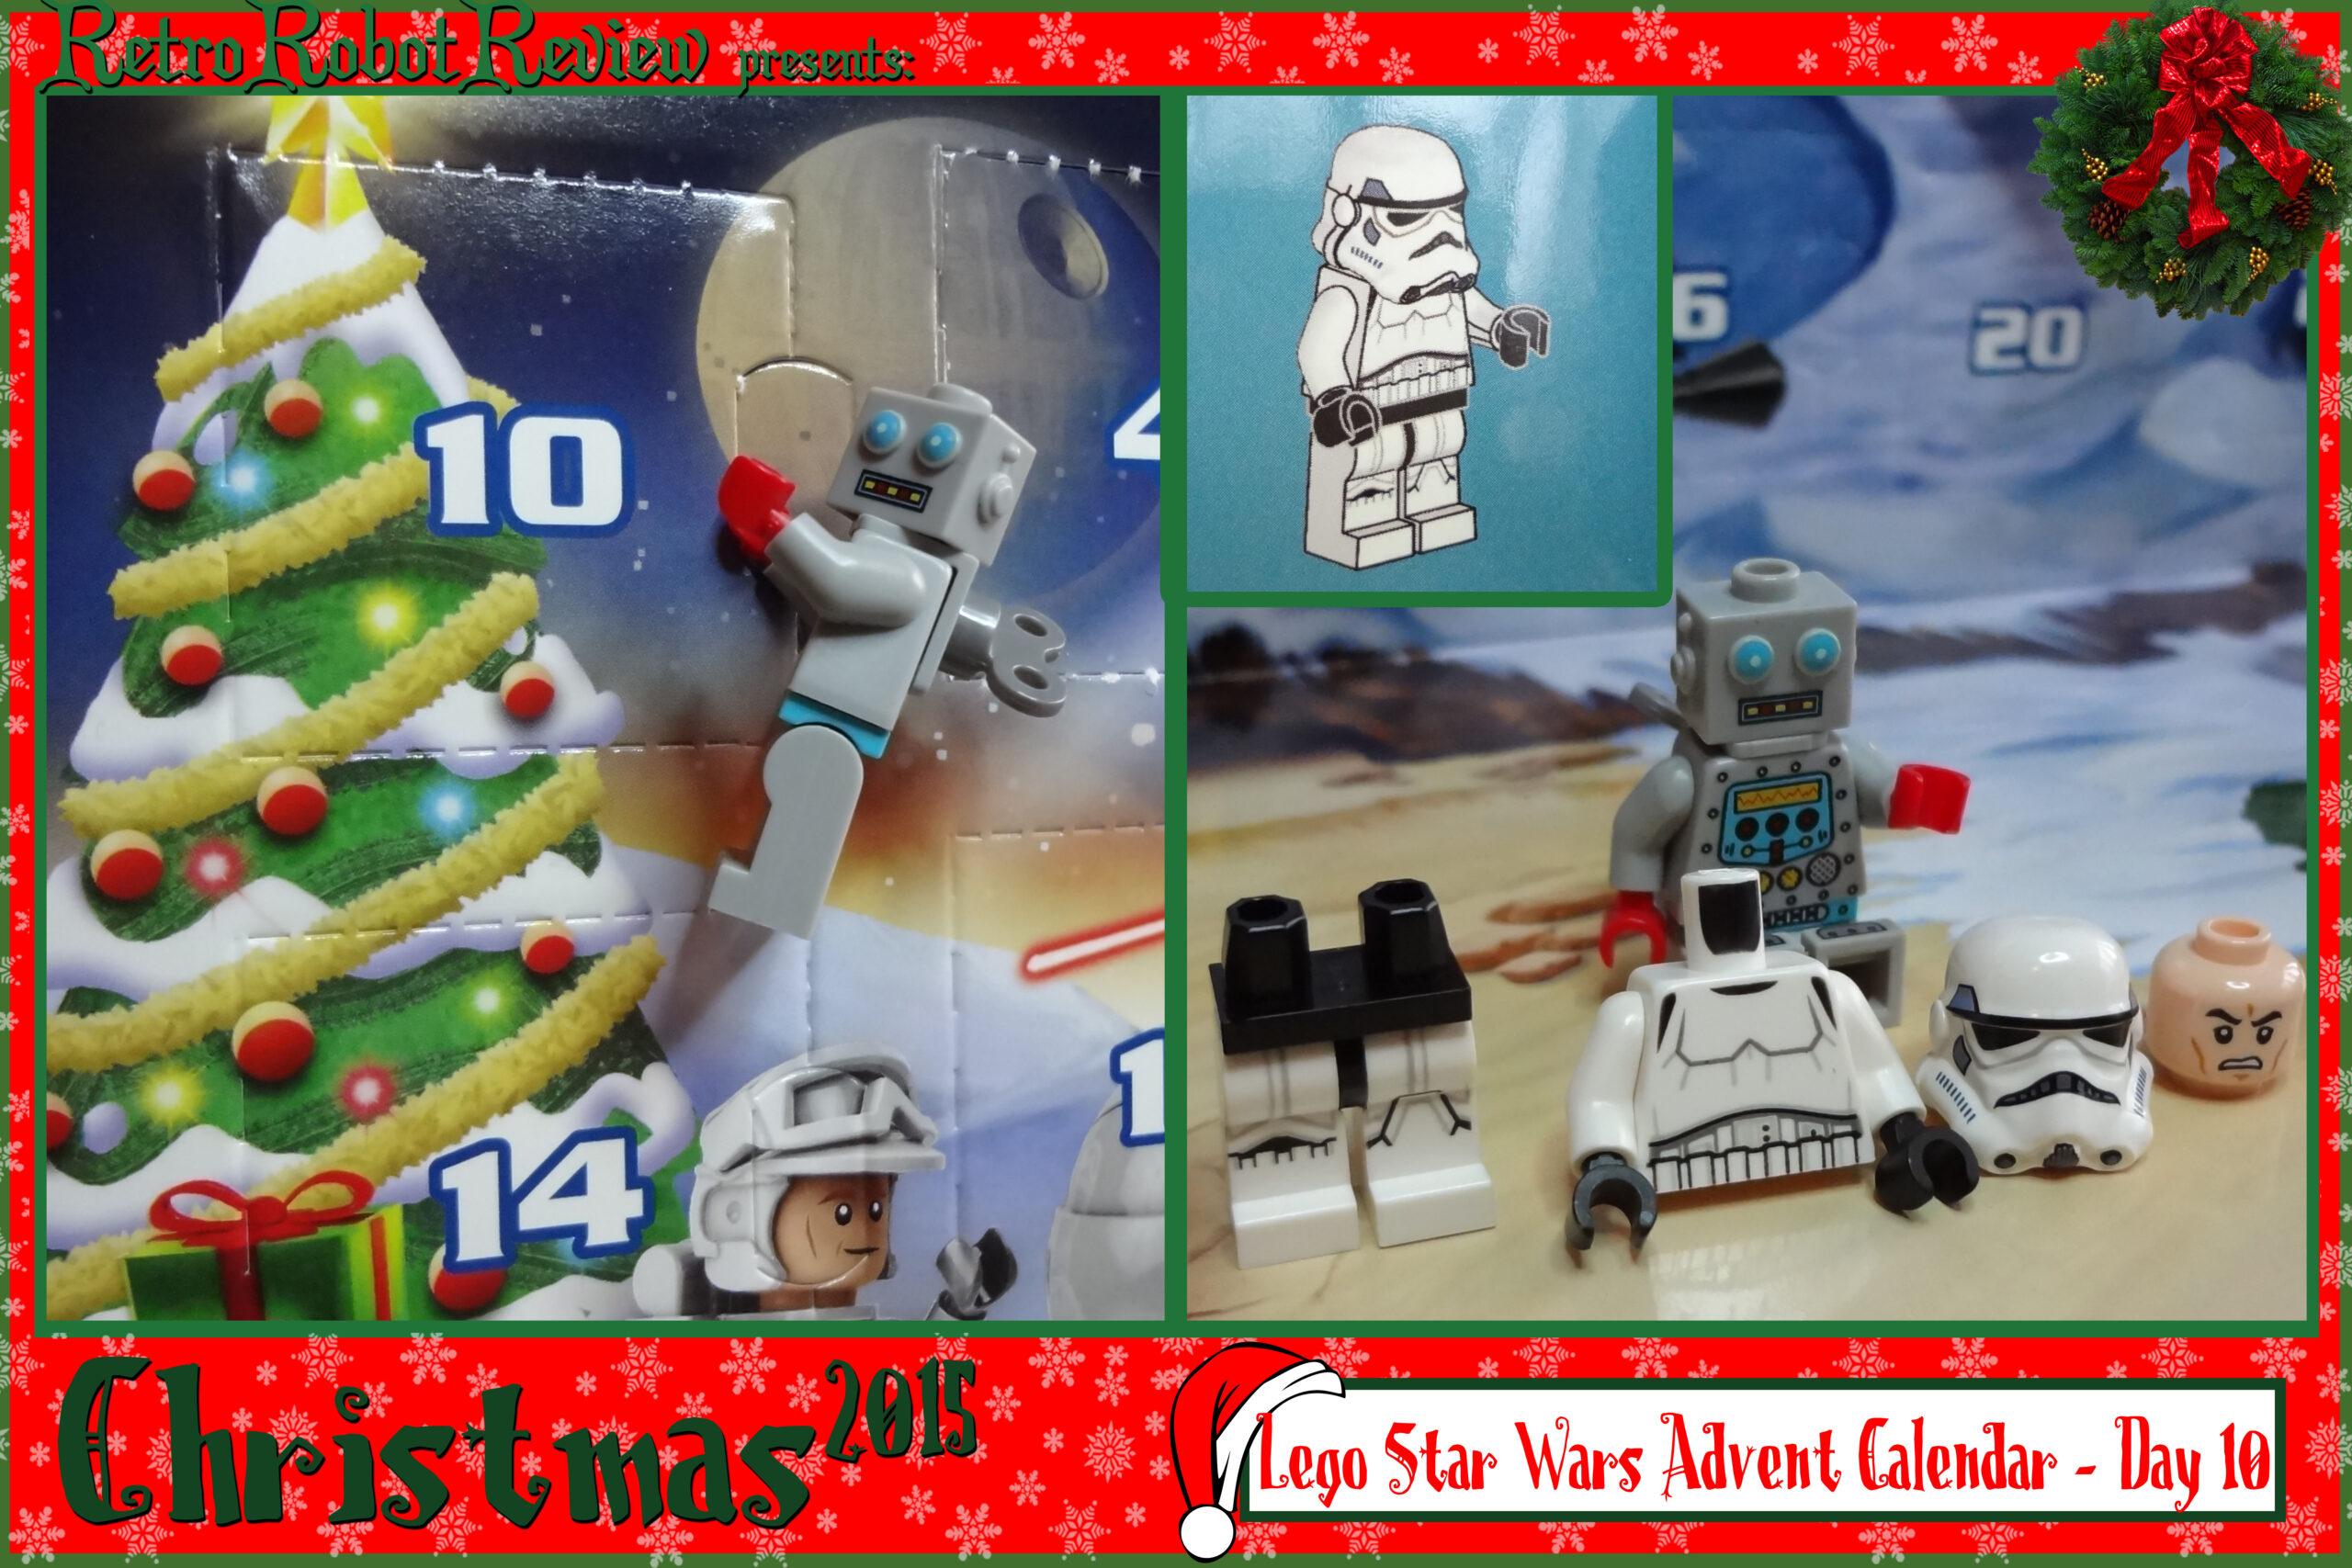 Lego Star Wars Advent Calendar  Day 10 pertaining to Lego Star Wars Advent Calendar Instructions